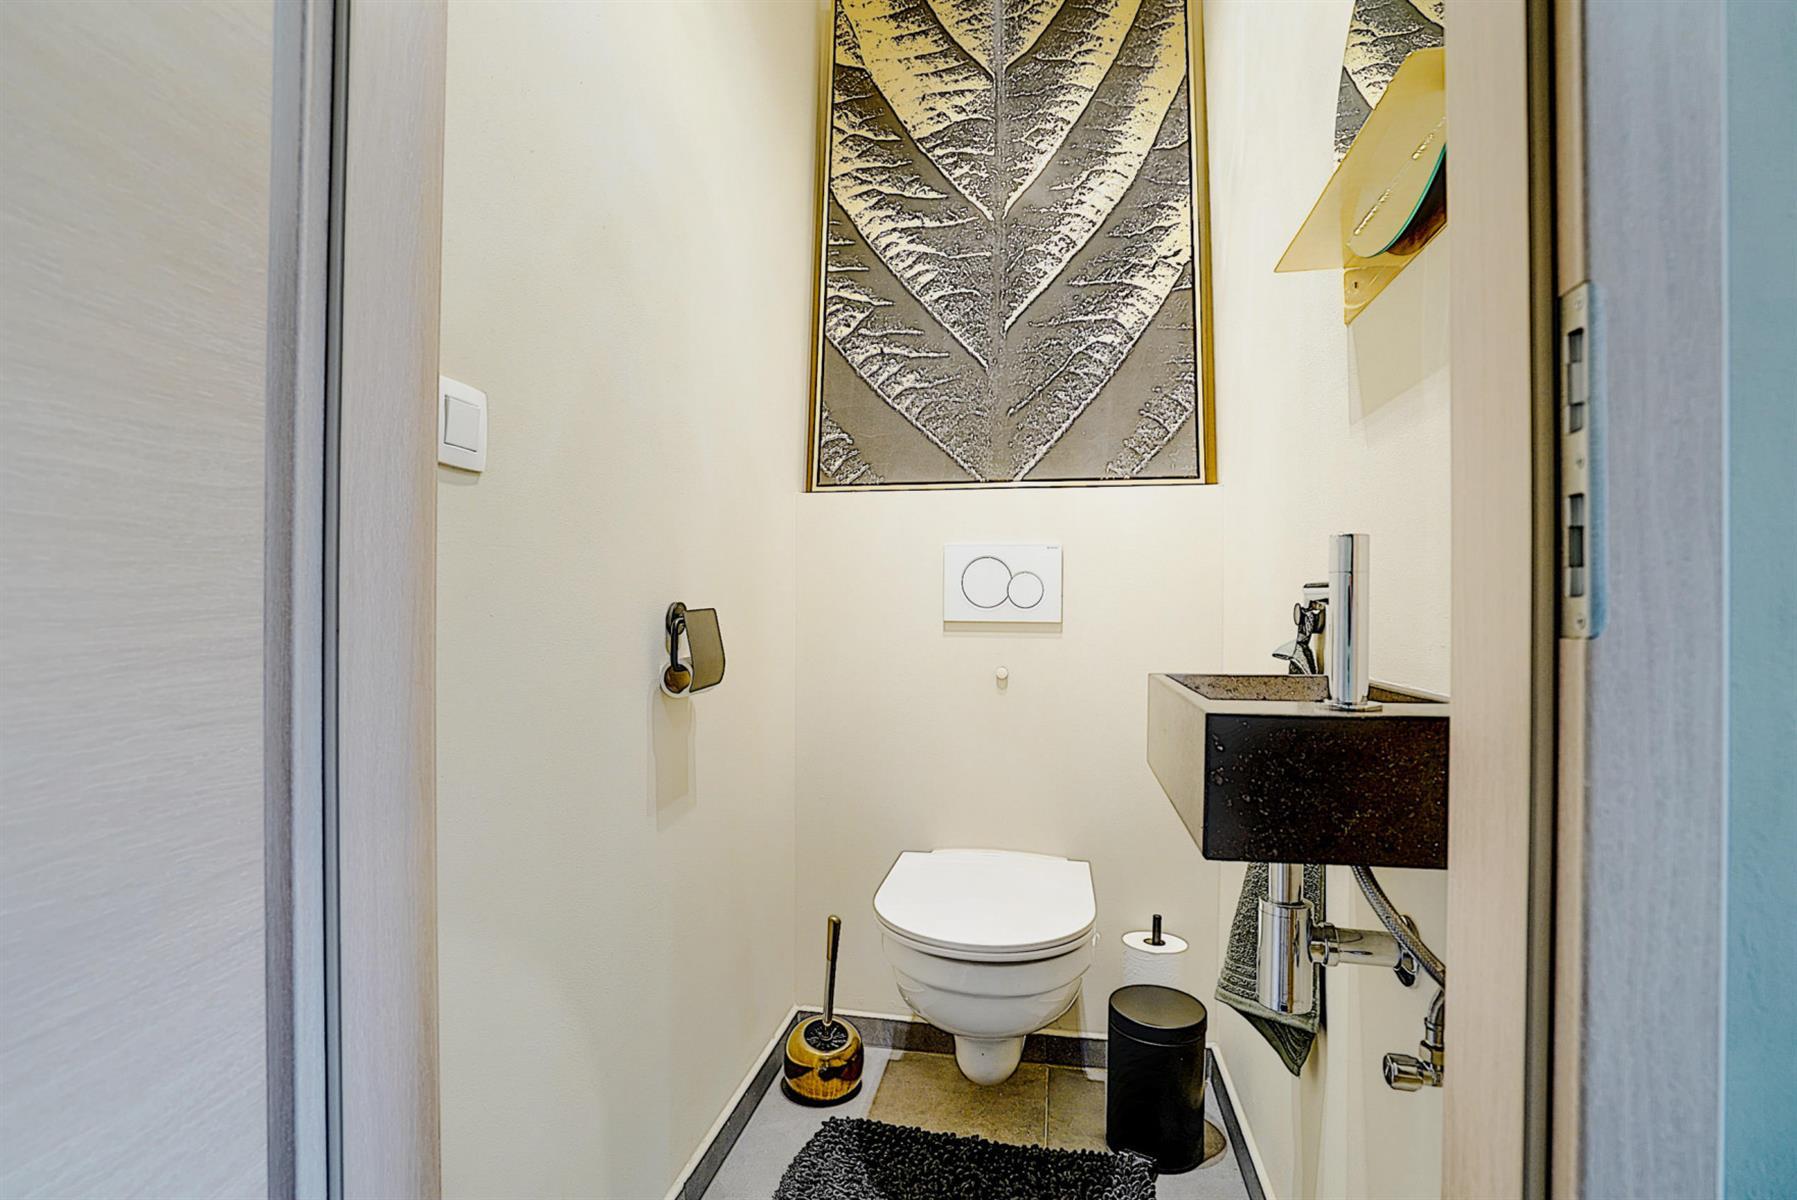 Appartement - Grâce-hollogne - #4364483-18